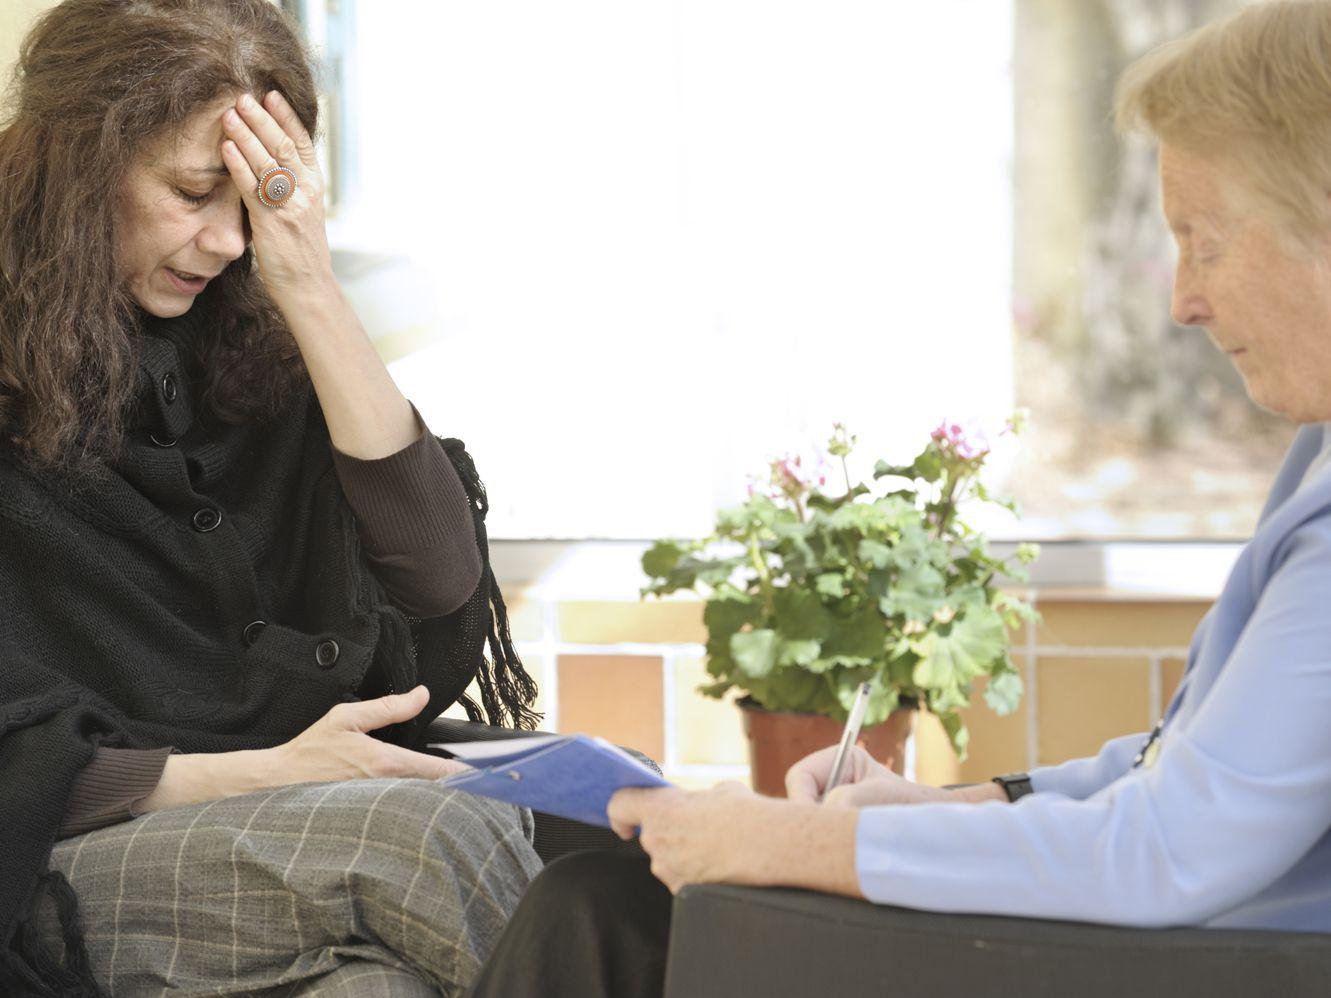 How Clinical Interviews Help Diagnose Mental Illness